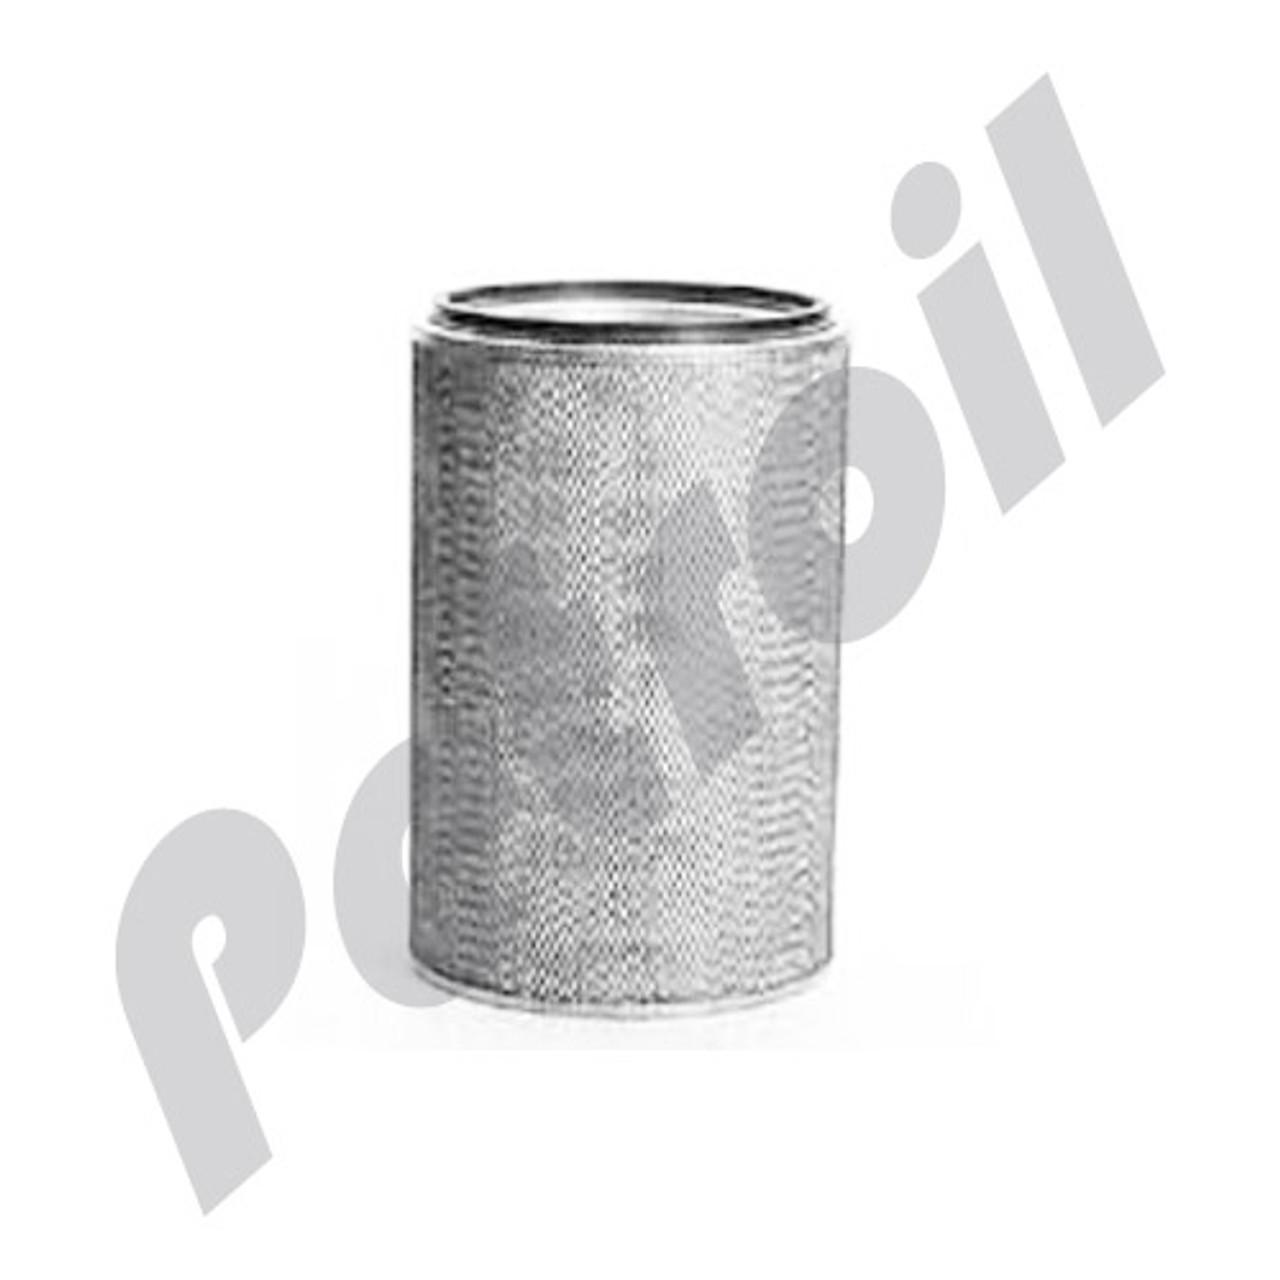 Luftfilter DONALDSON P772552